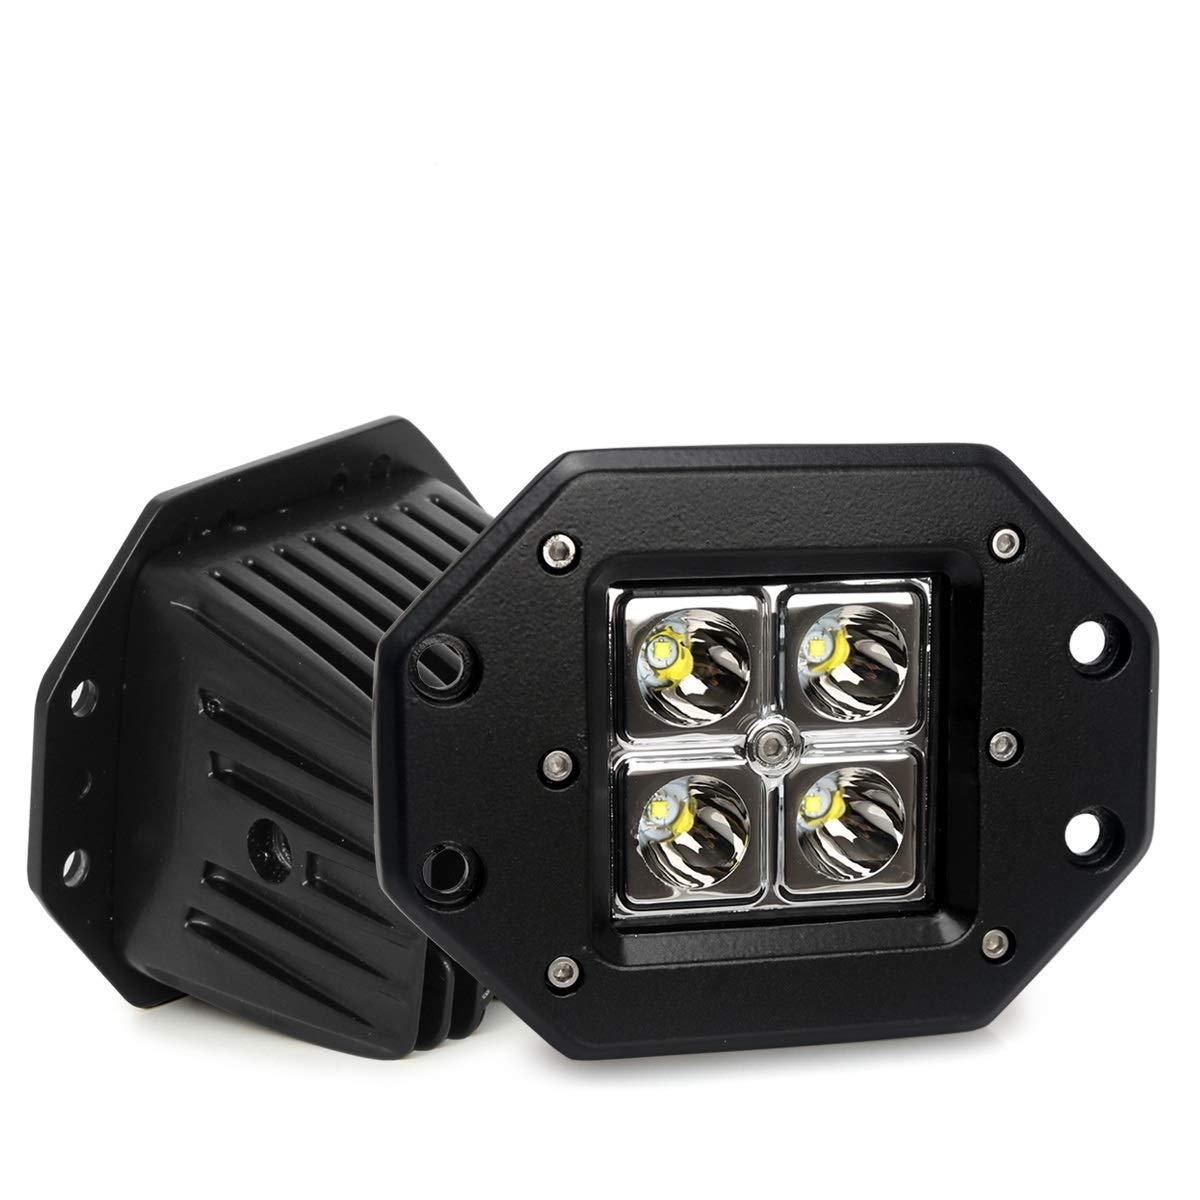 4x4 Offroad Vehicles 2 Years Warranty Green-L Spot LED Work Light Bar Spot Beam DC 10-30v Waterproof Working Lamps for Trucks